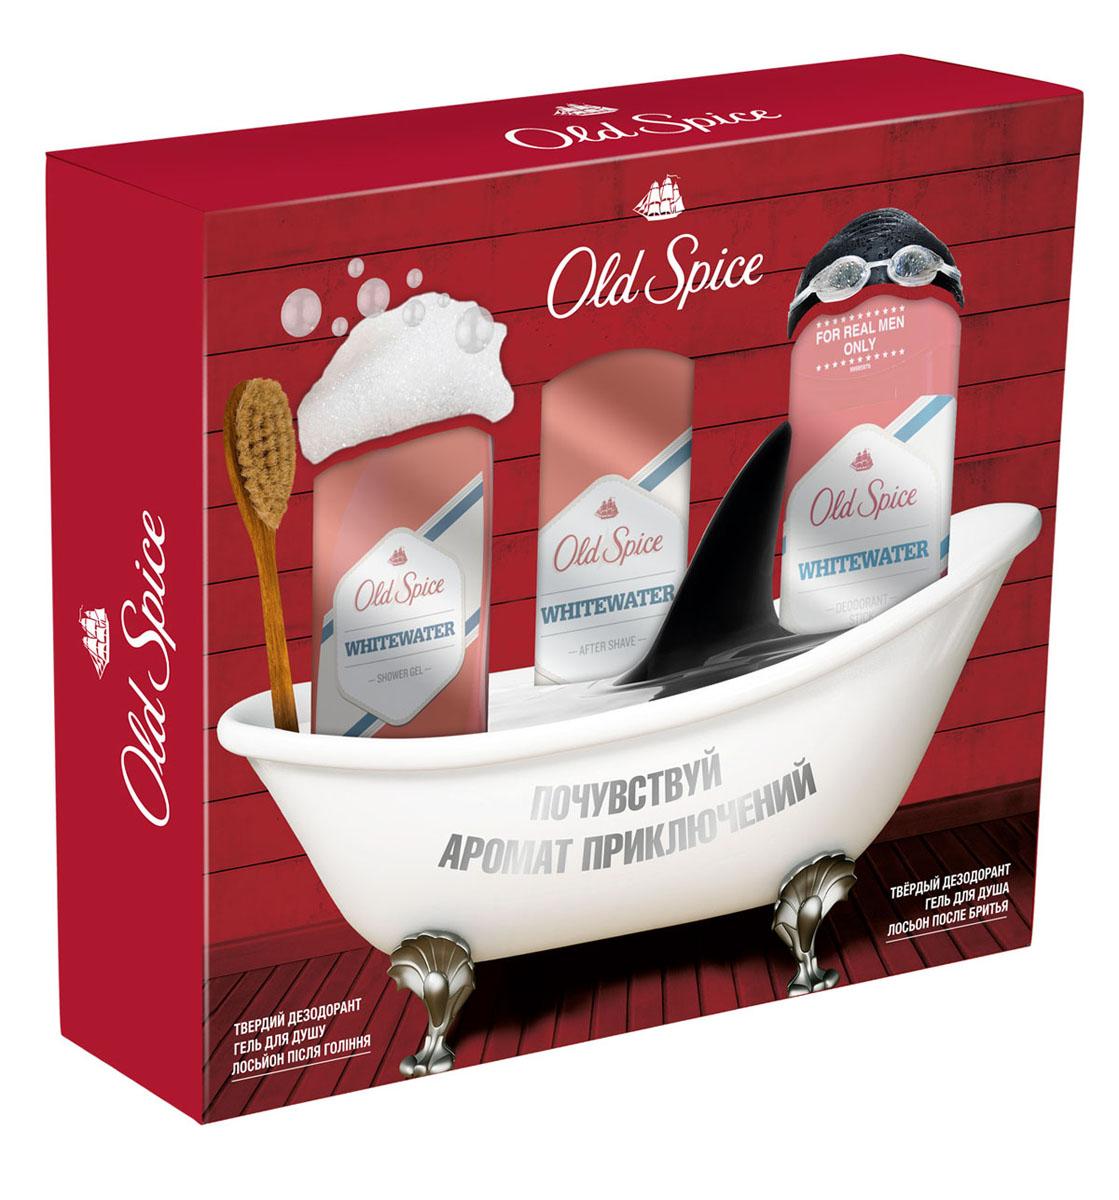 Old Spice Подарочный набор WHITEWATER: Твердый дезодорант 50мл + Гель для душа 250мл + Лосьон после бритья 100мл